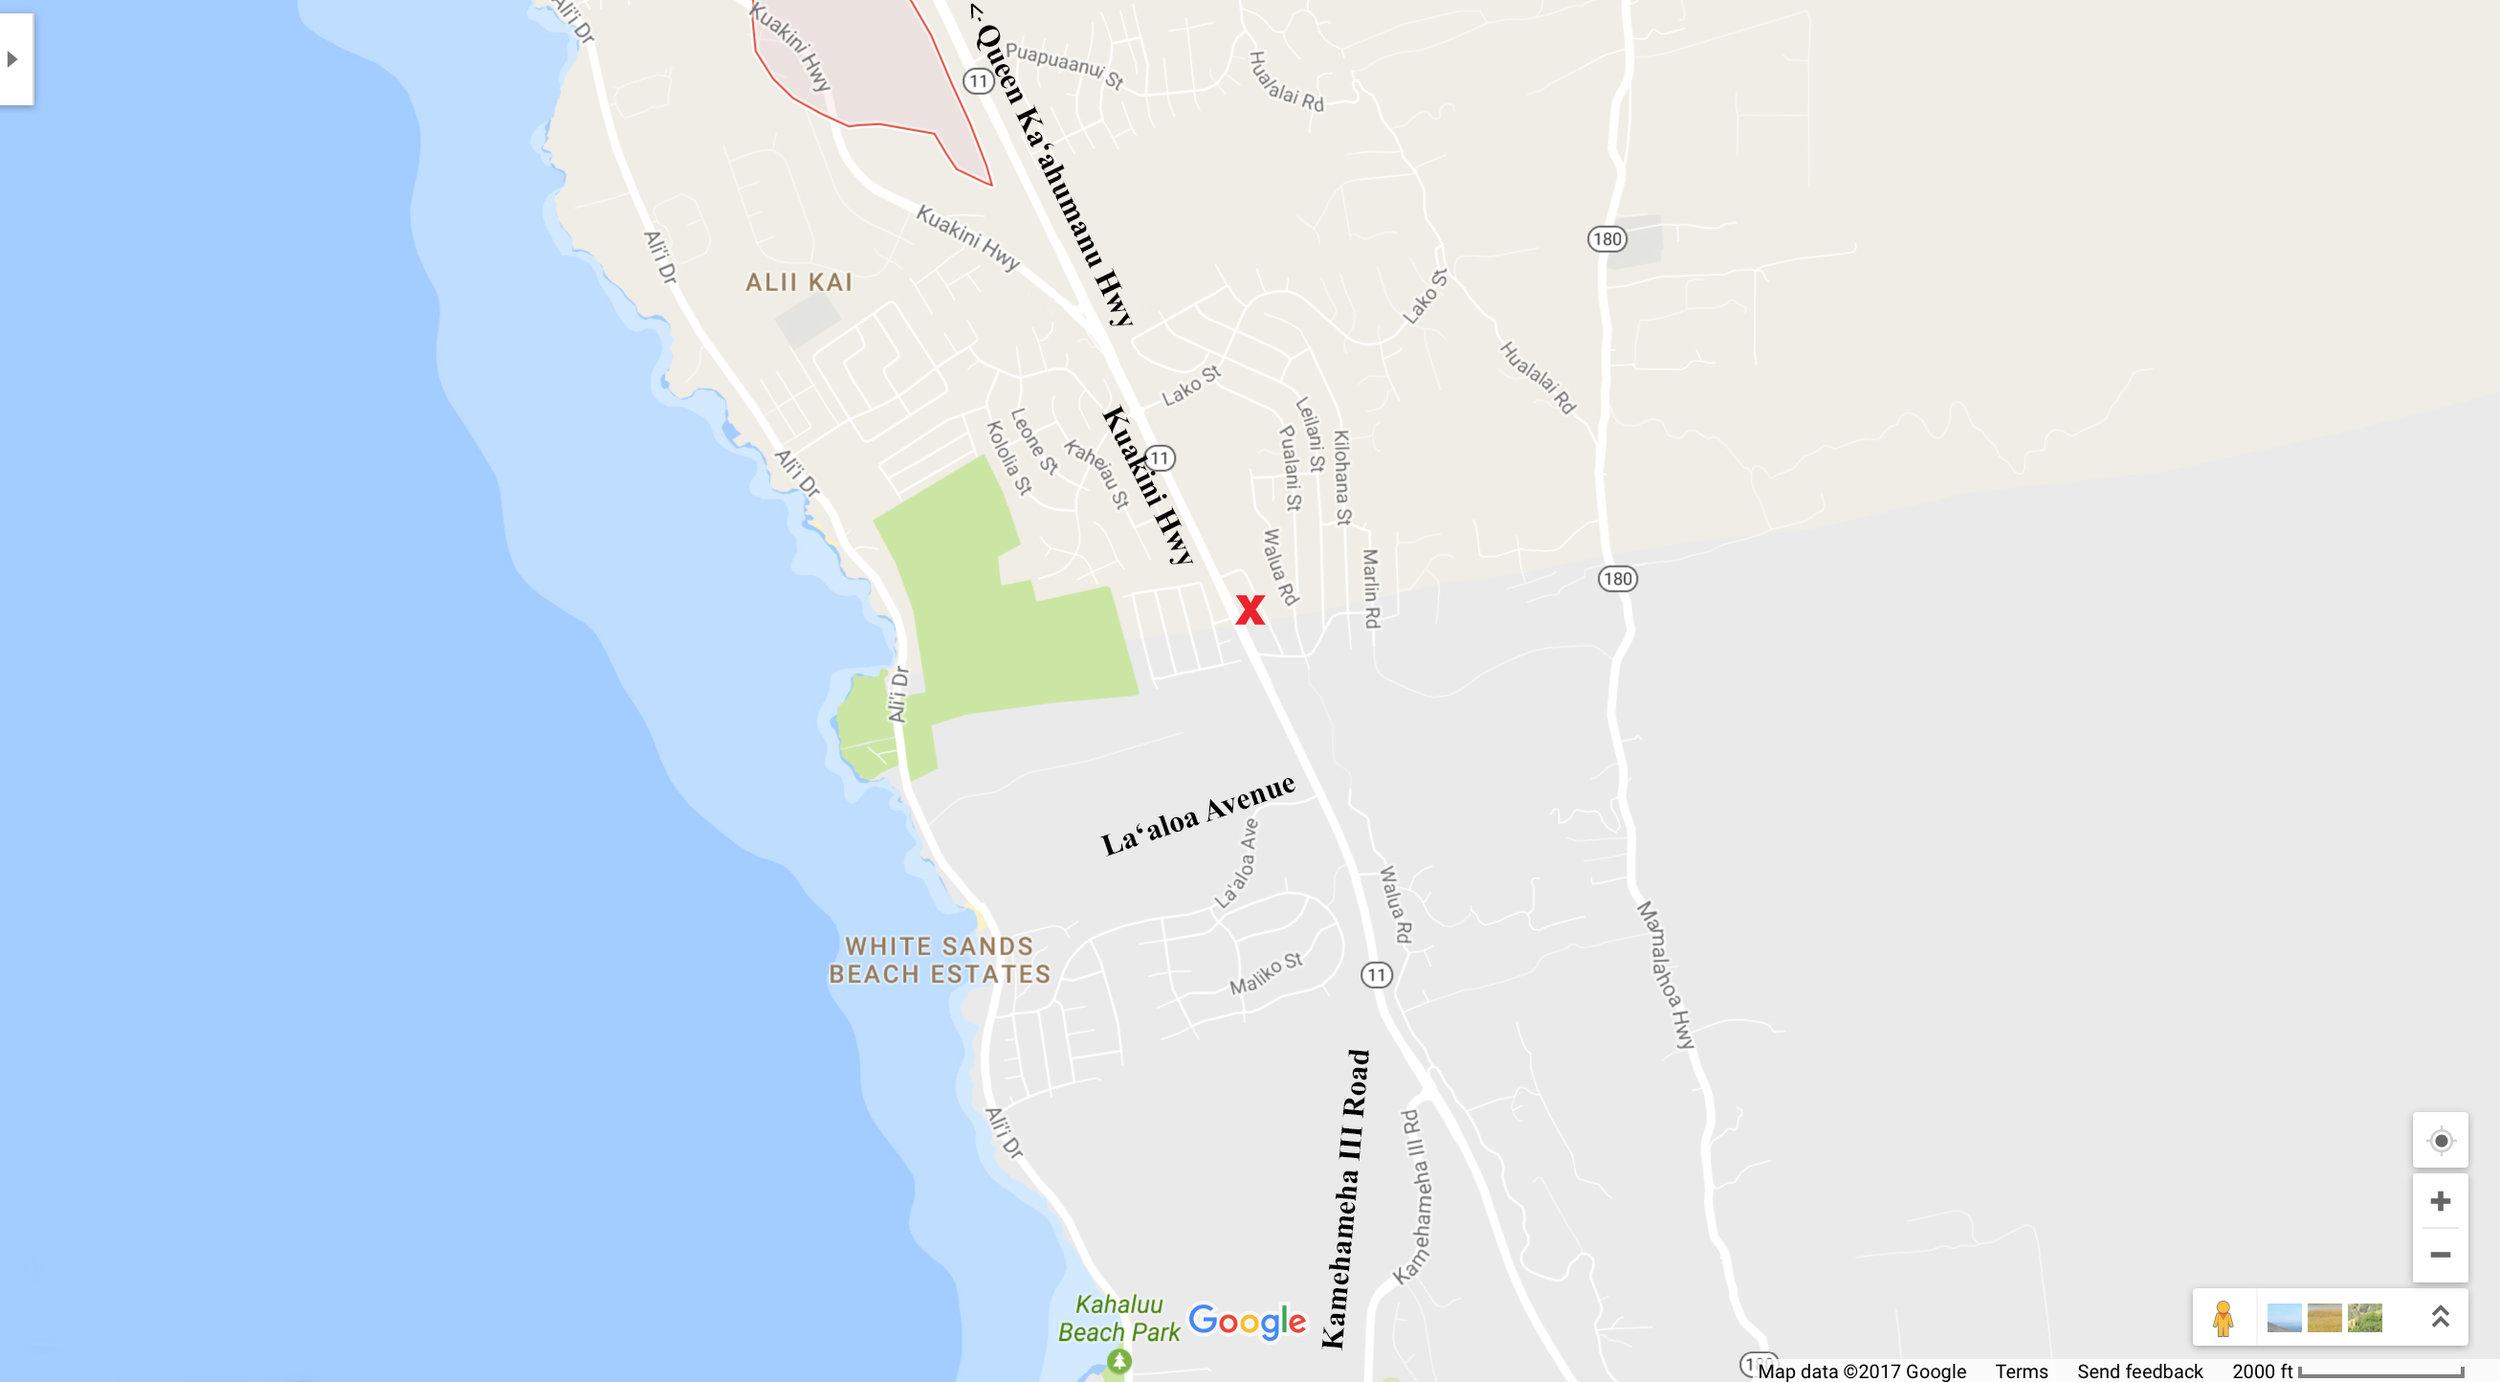 Google Maps Snap 2